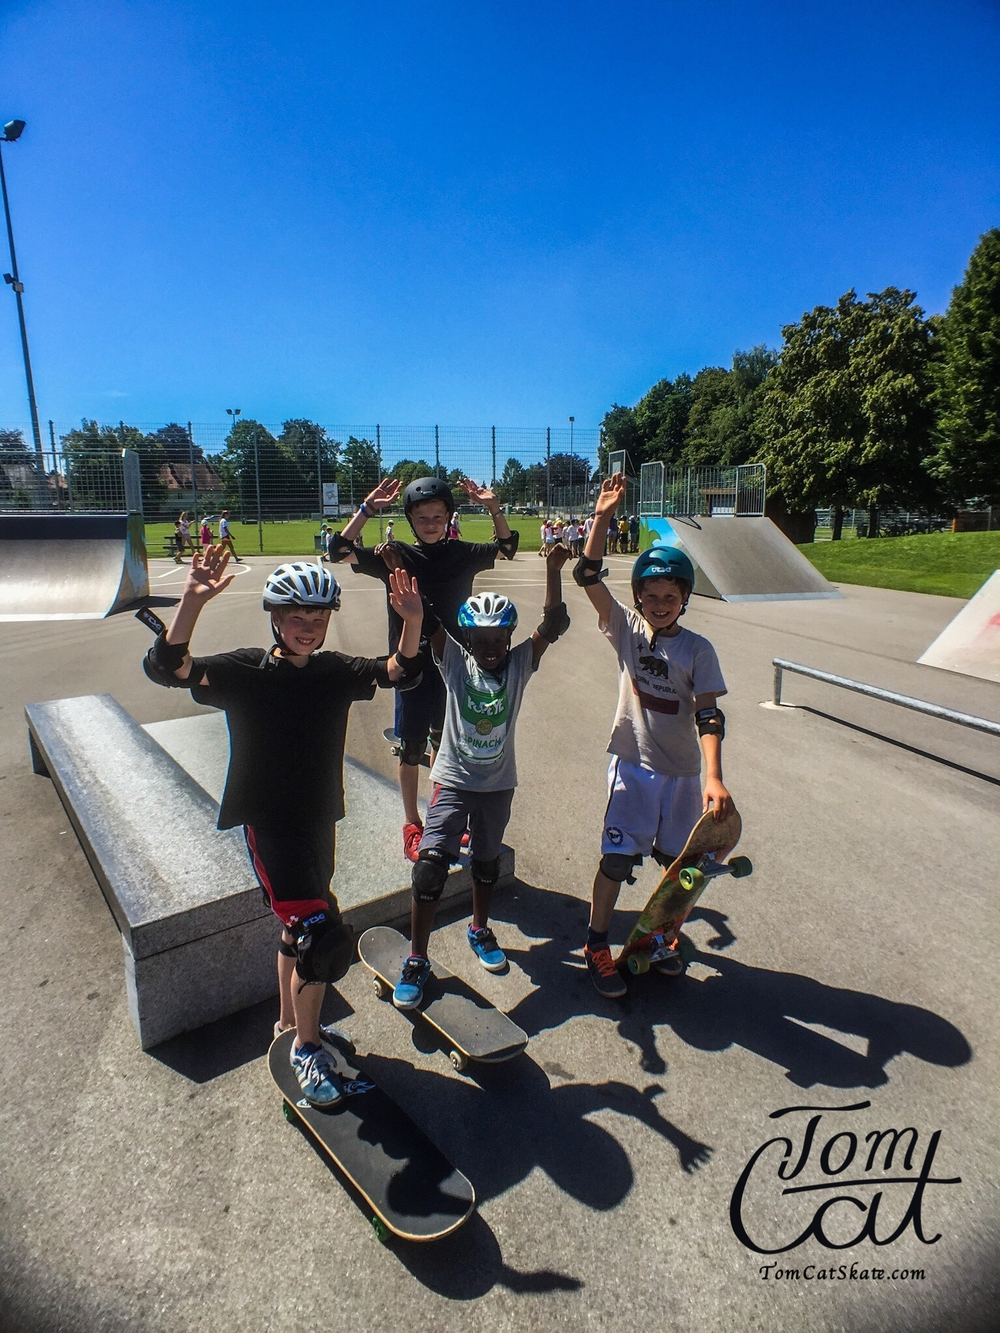 Skatekurs München Pullach mit Profi Skateboarder Tom Cat .JPG